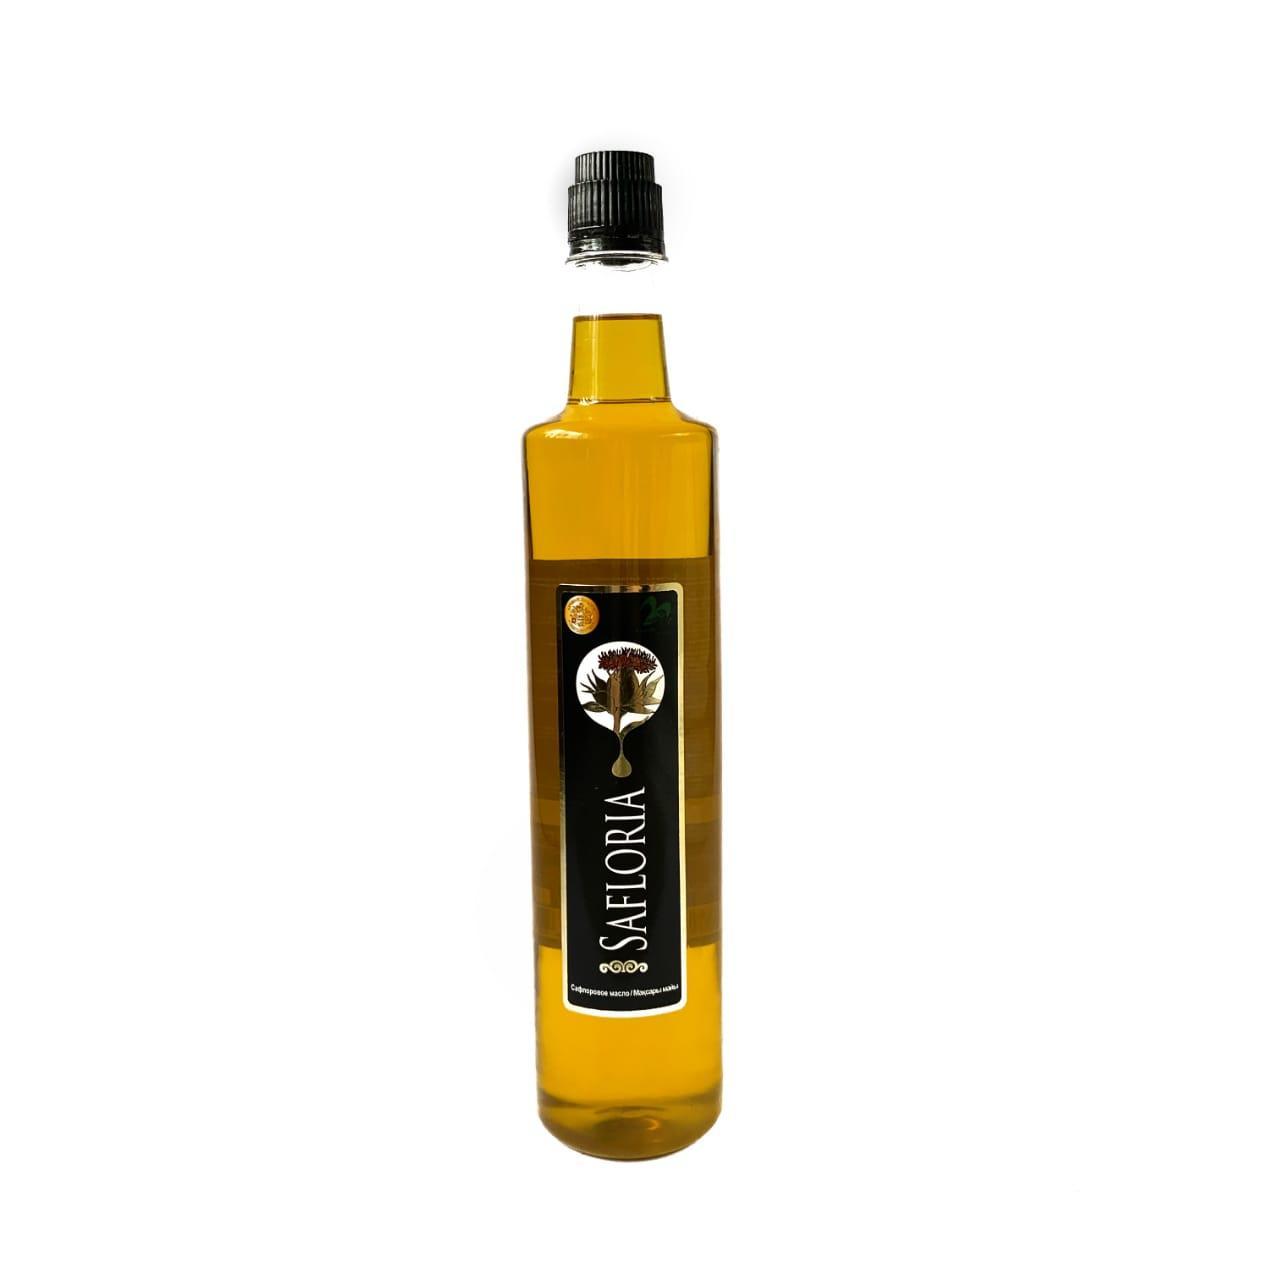 Сафлоровое масло 800мл